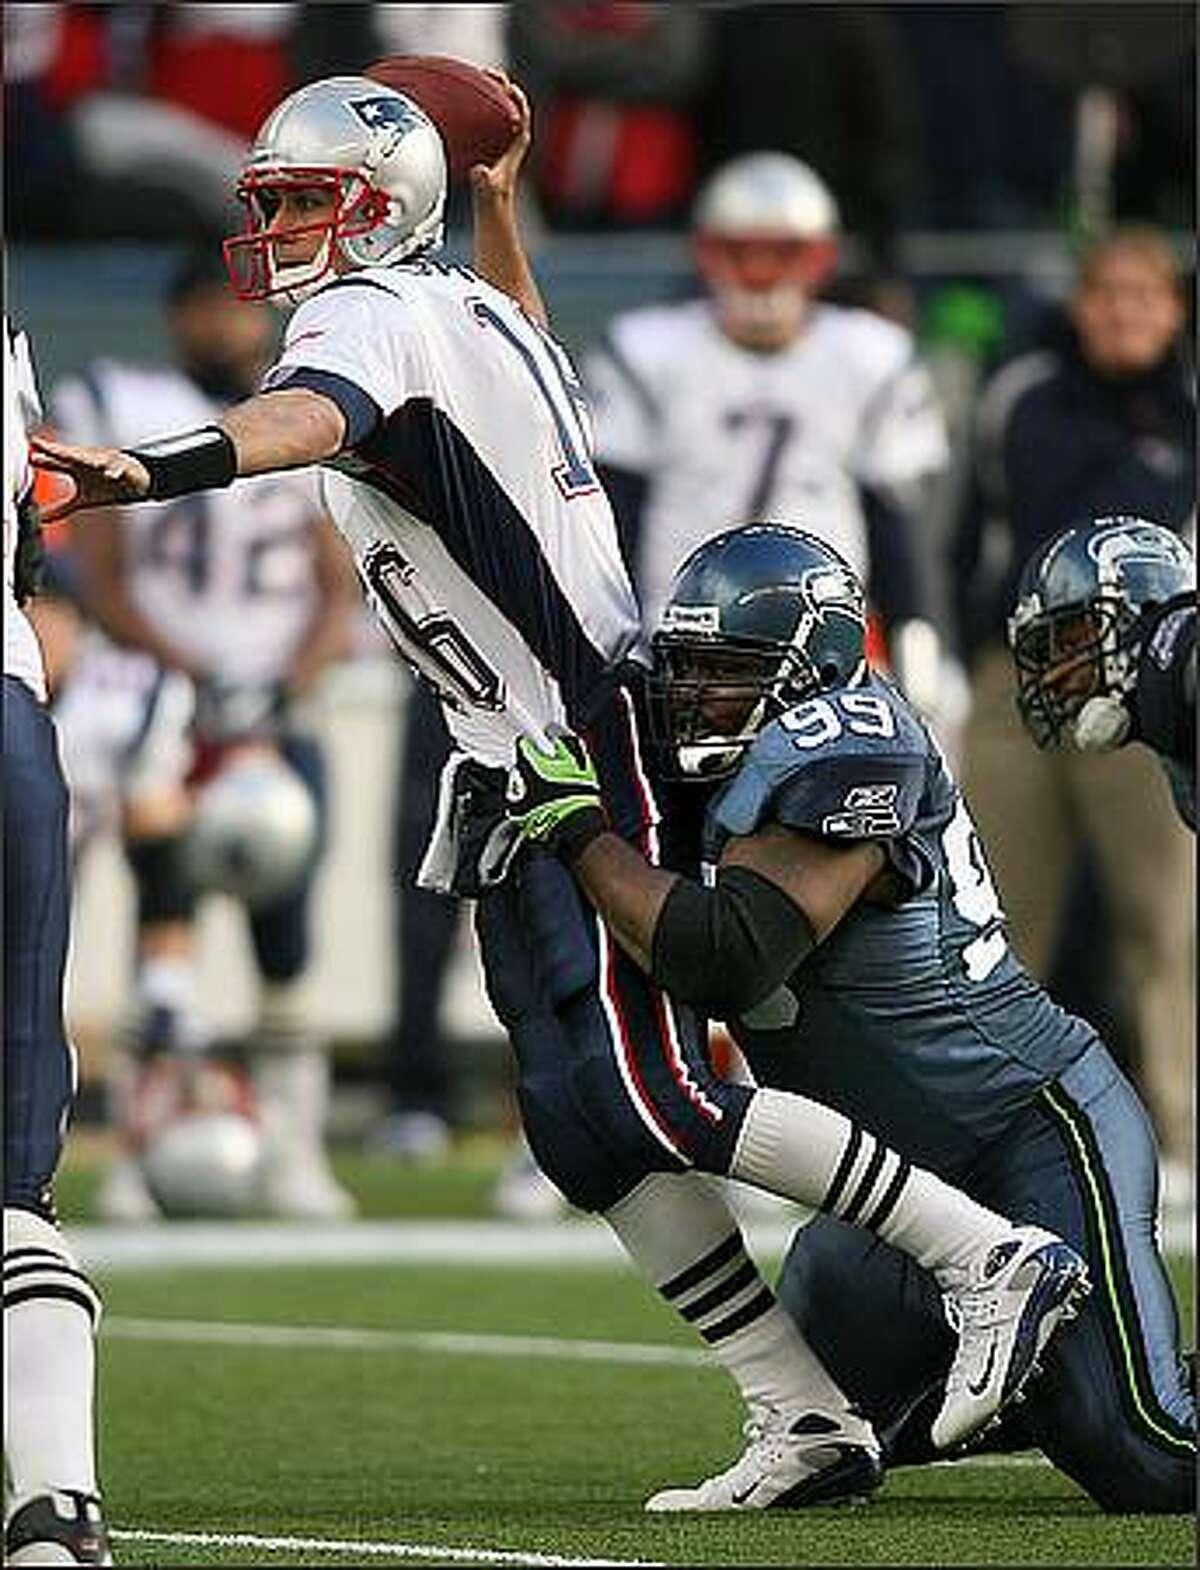 Seattle's Rocky Bernard applies pressure to Patriots quarterback Matt Cassell as he forces an incomplete pass in the second quarter.